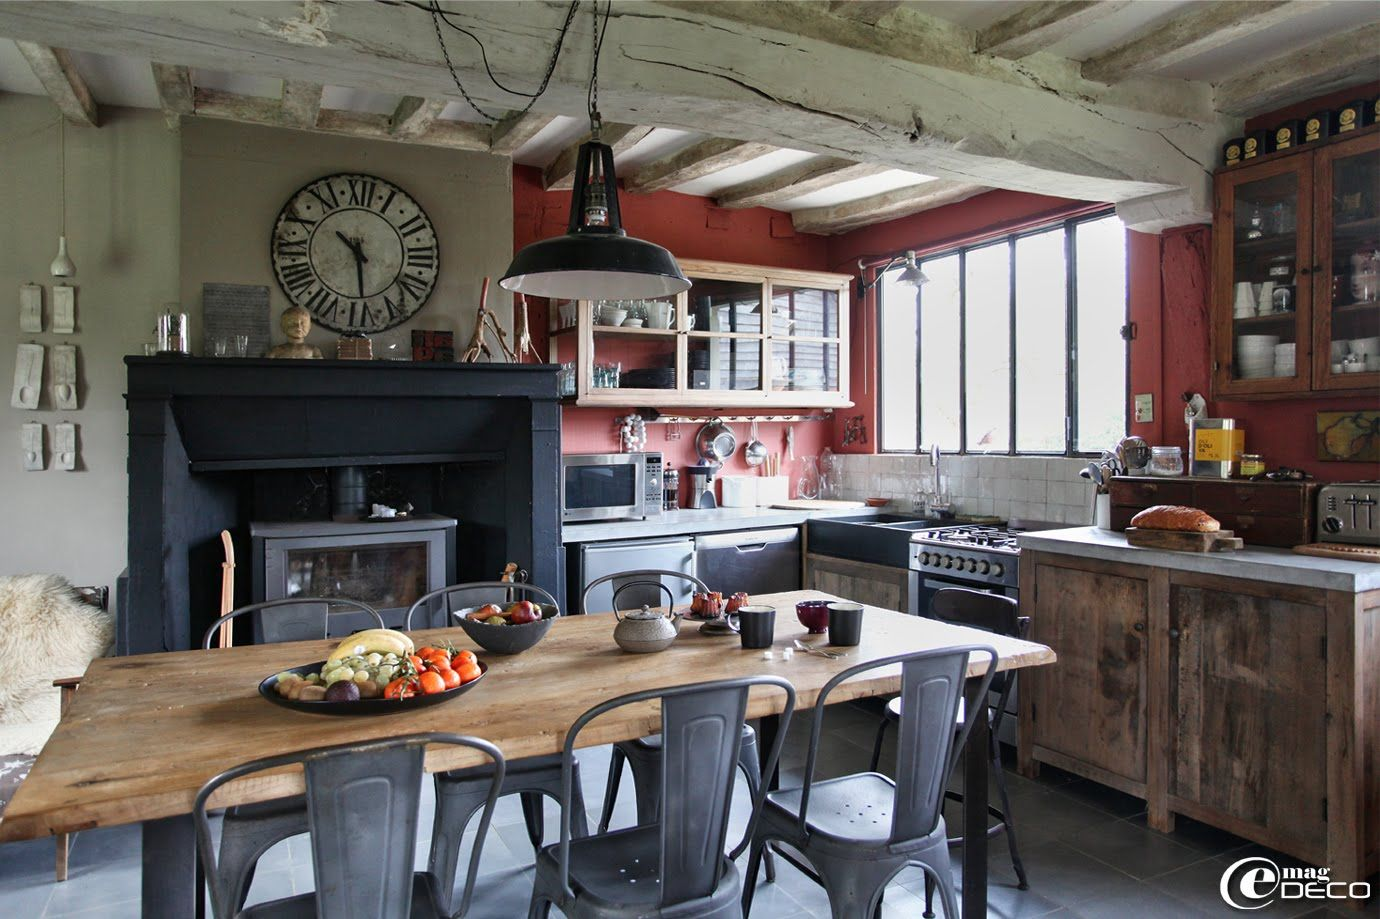 vieille cuisine repeinte renover vieille cuisine compiegne renover une cuisine with vieille. Black Bedroom Furniture Sets. Home Design Ideas